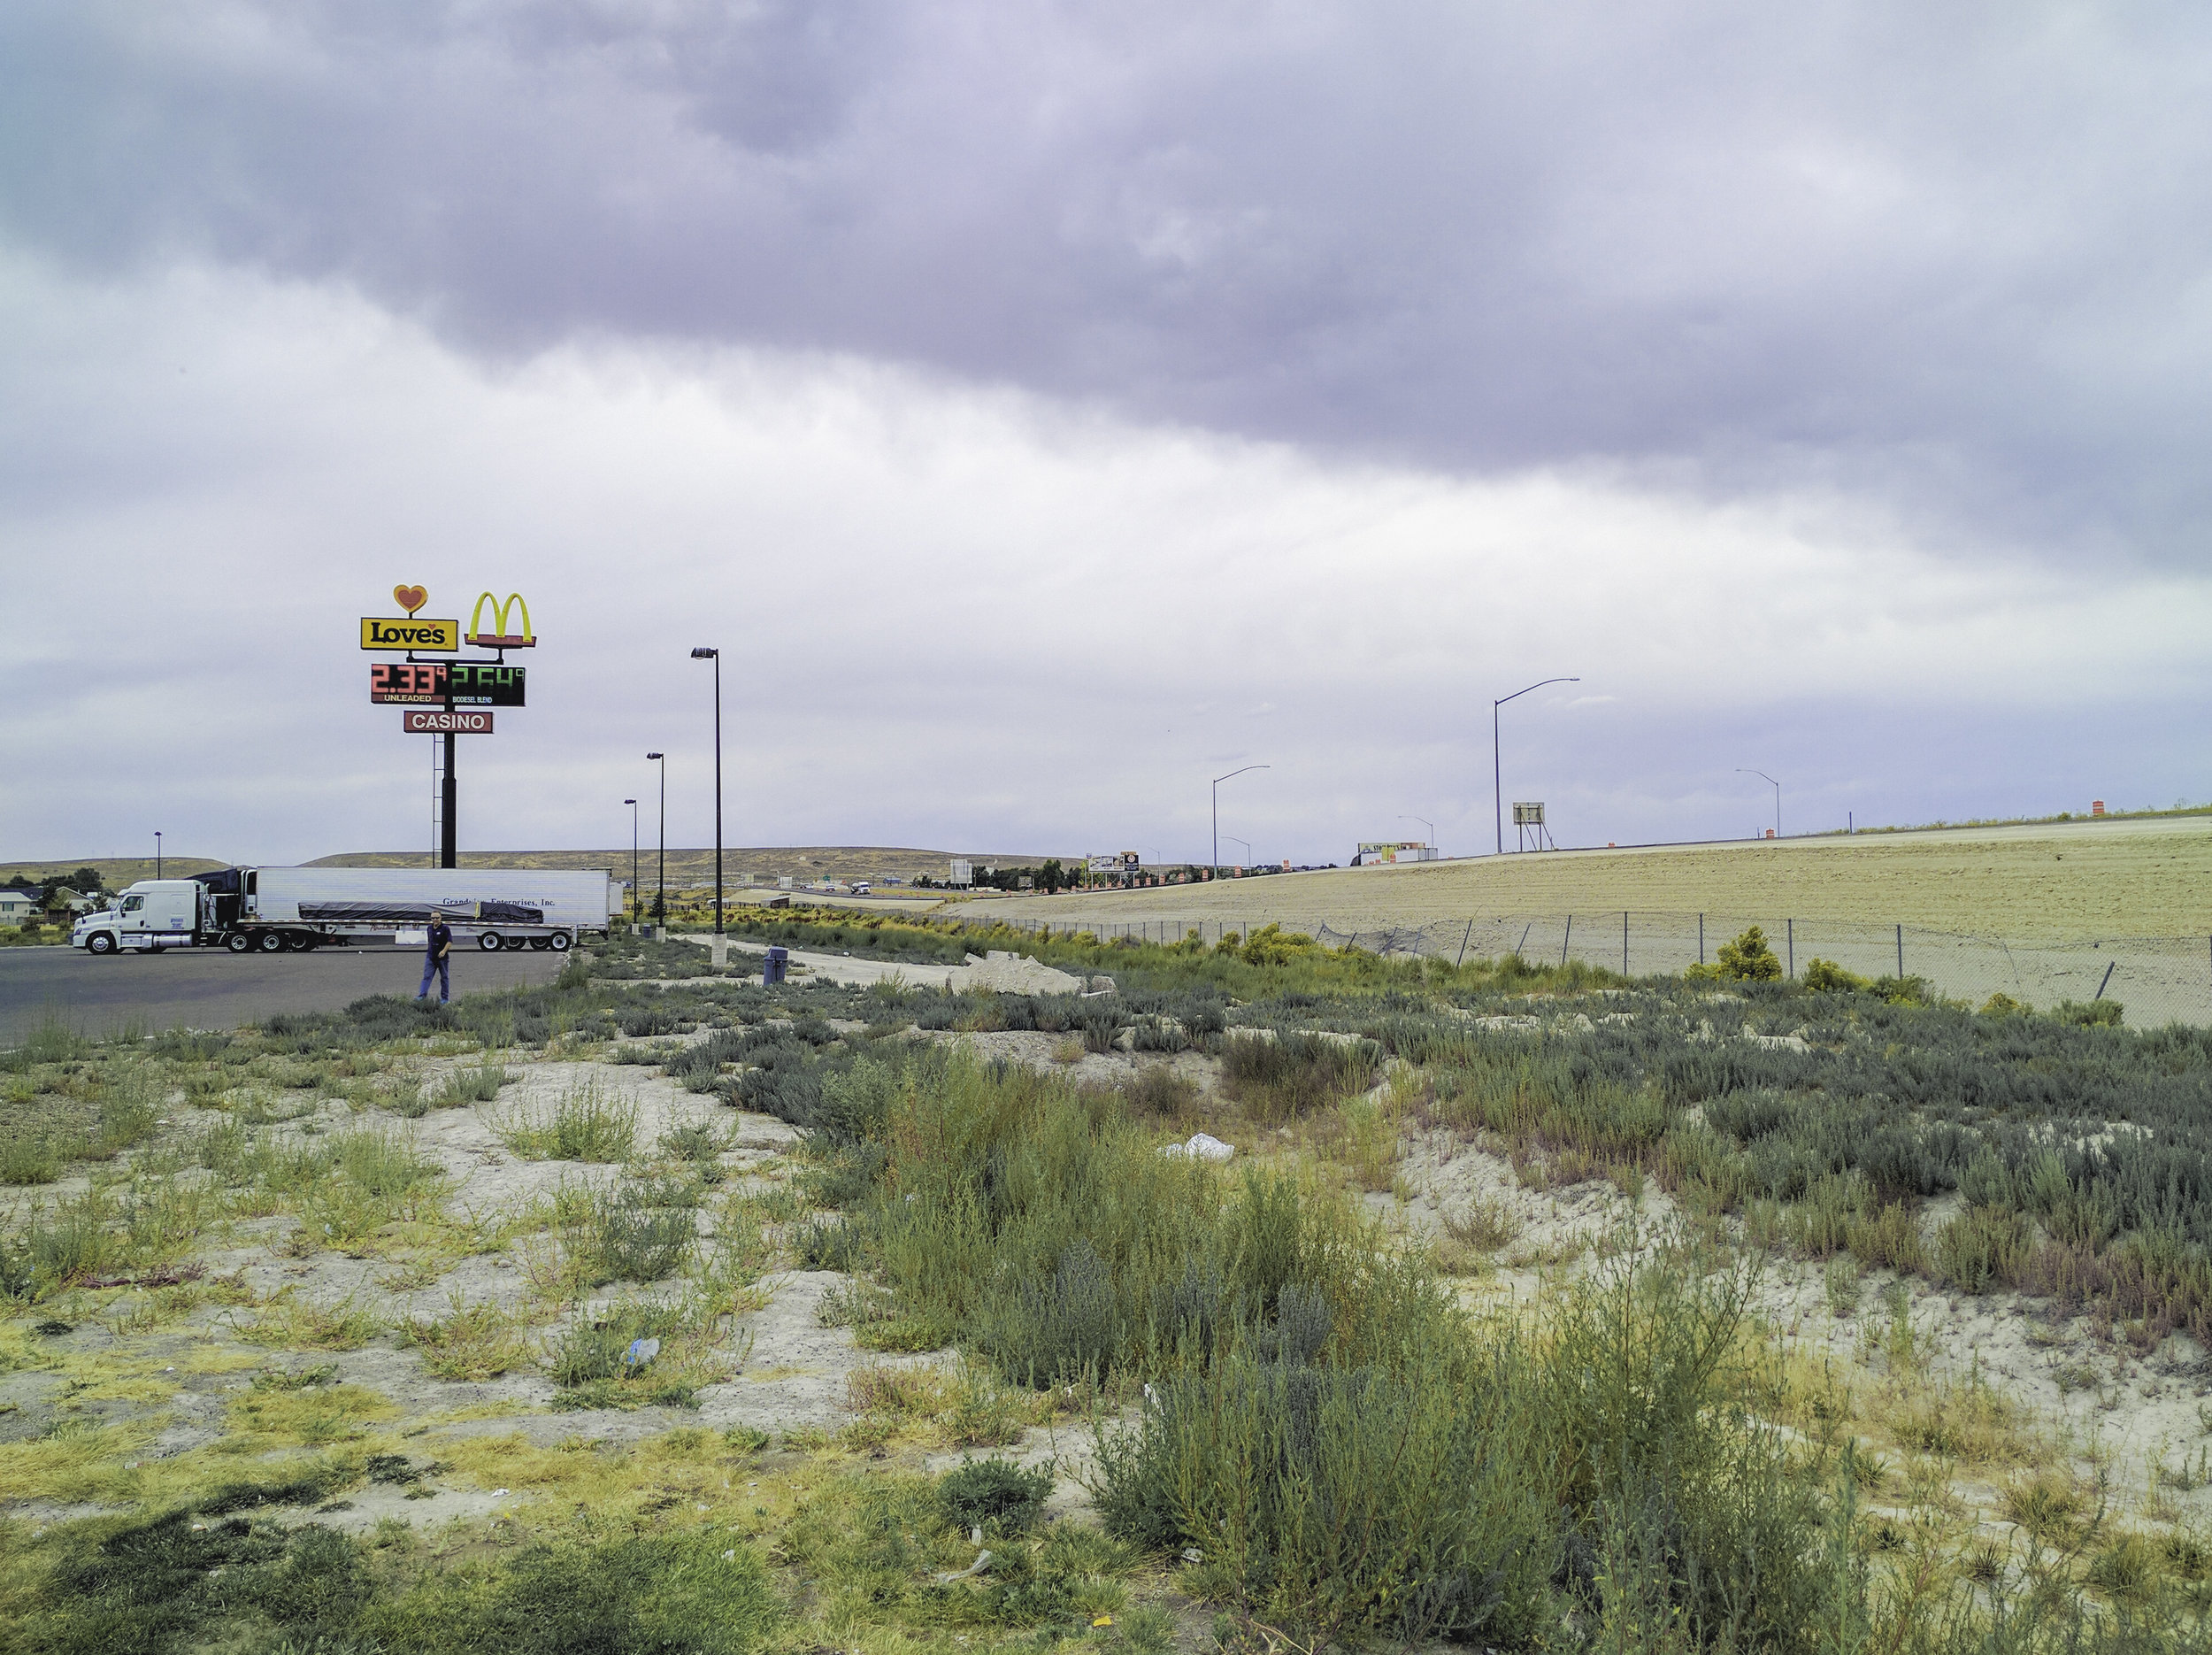 Scenic Nevada. Co-Driver pictured in center left.